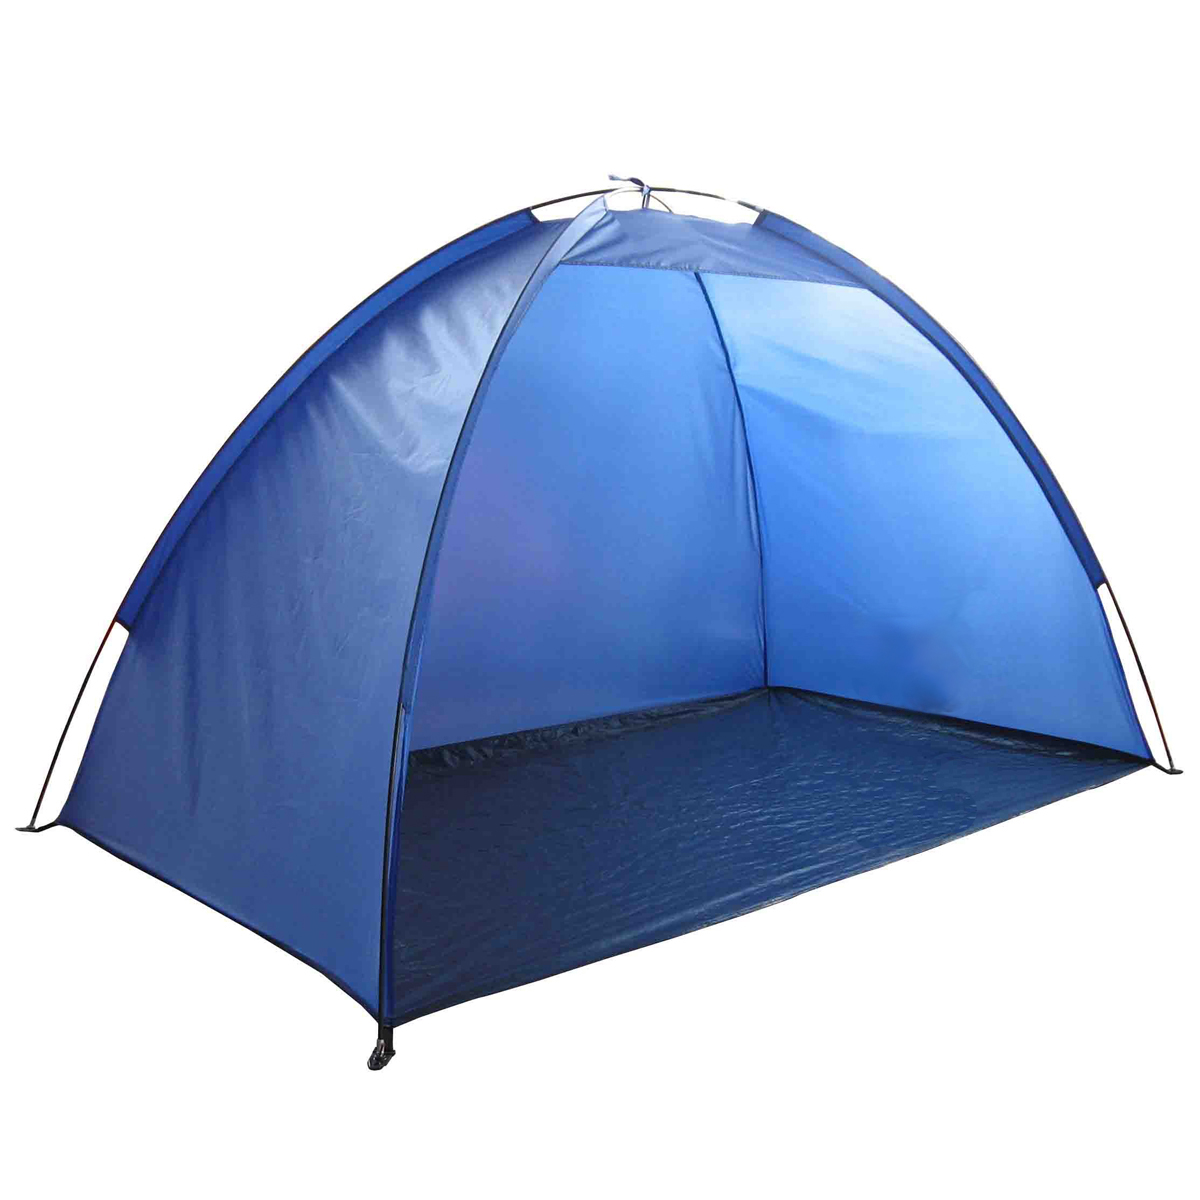 Pop Up Sun Shelter For Beach : Blue portable sun shade shelter cabana beach protection